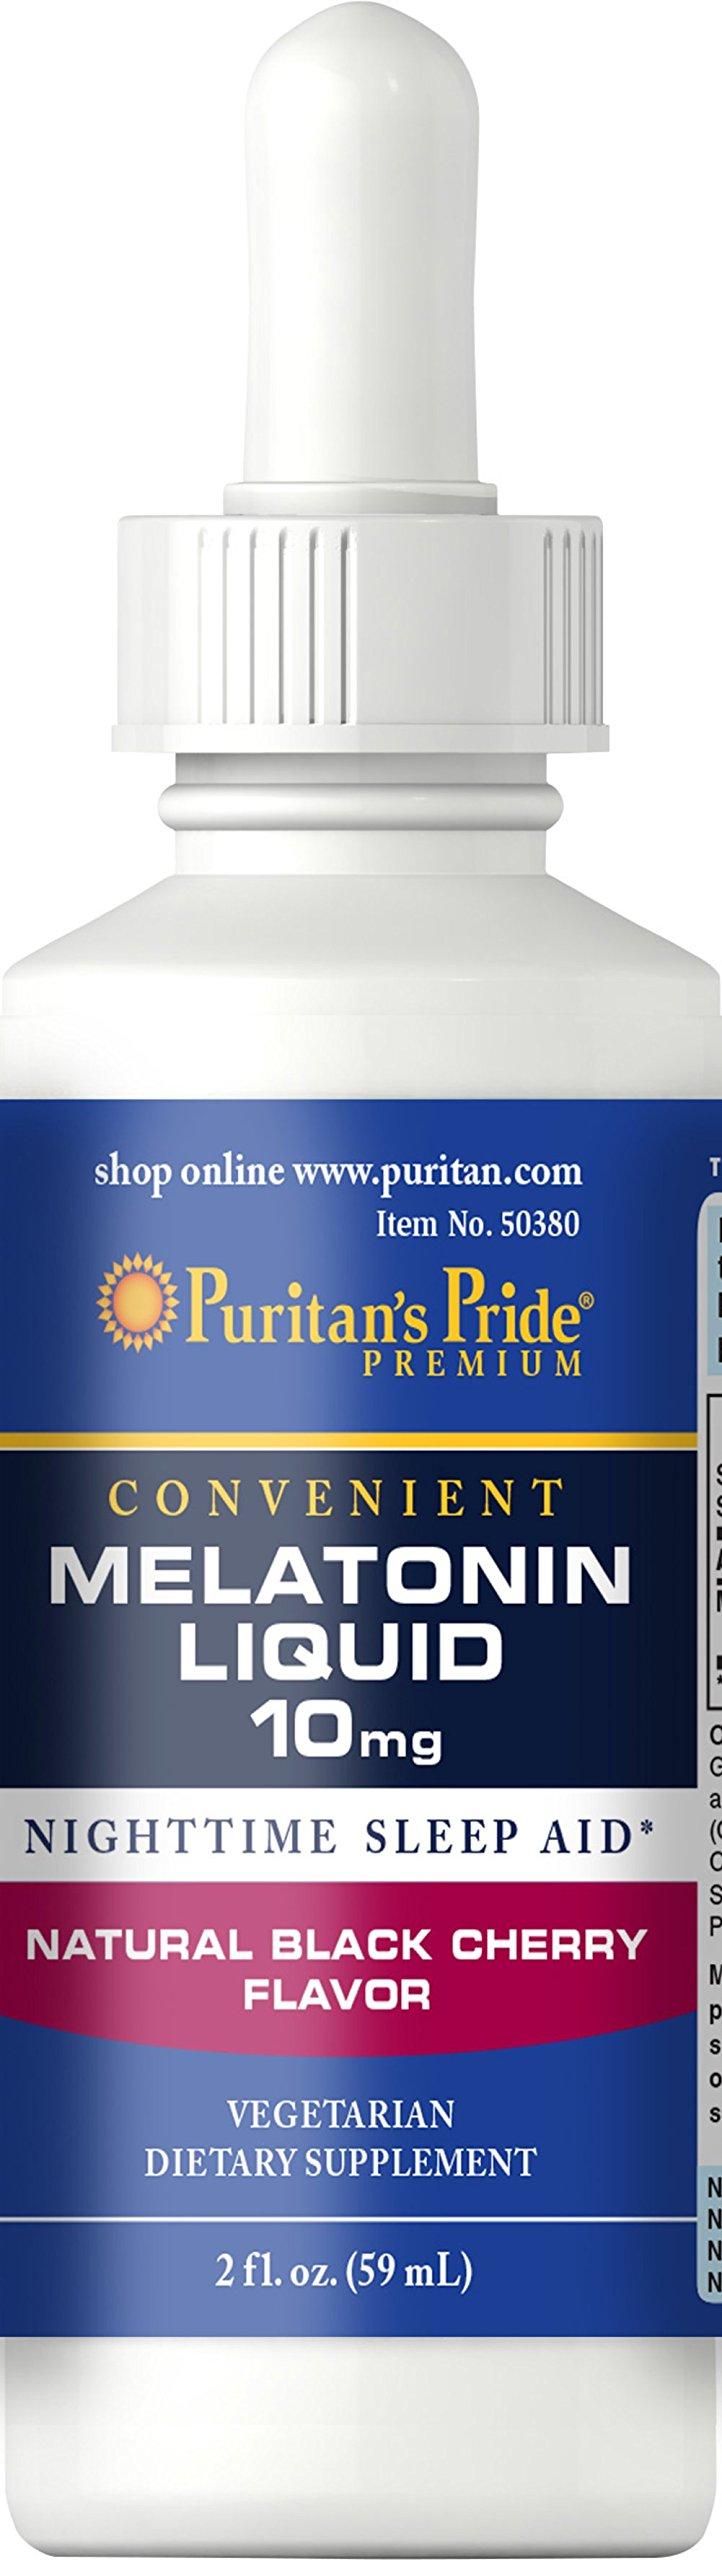 Puritans Pride Melatonin Black Cherry Liquid 10 mg-2 oz Liquid